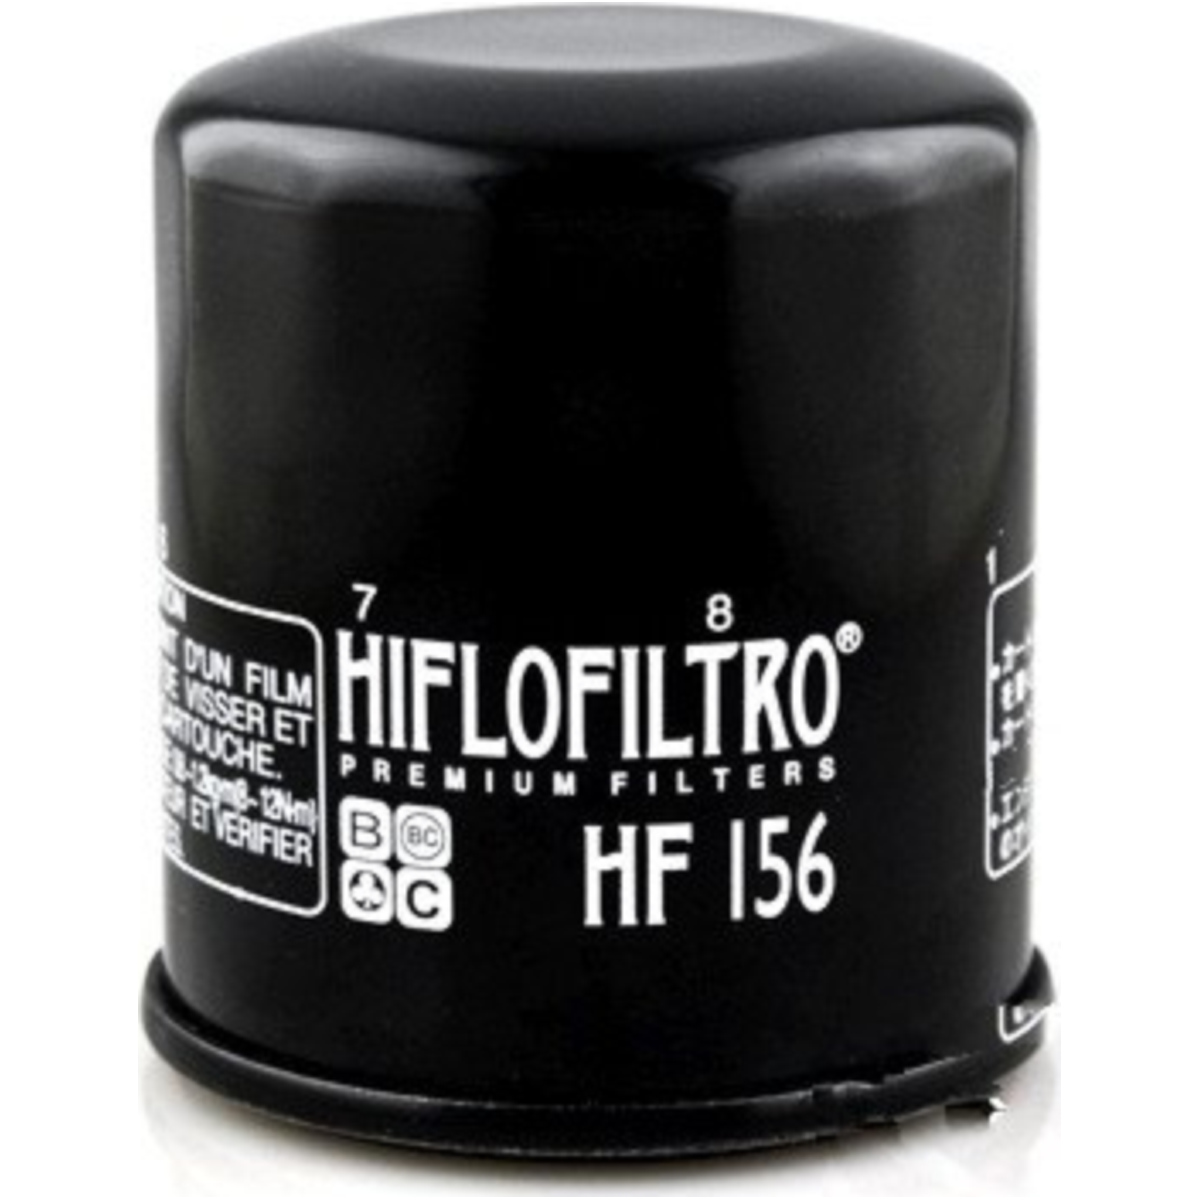 /Ölfilter HIFLOFILTRO f/ür KTM EXC 400/LC4/Competition 1996/30//41/PS 22//30/kw